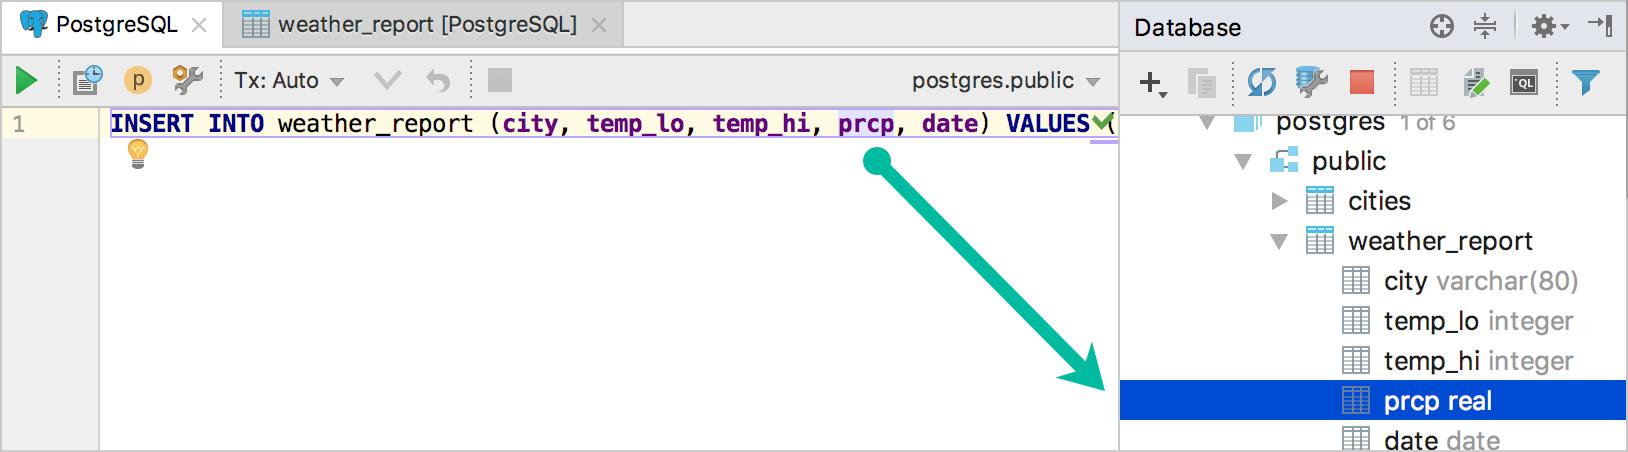 Navigate to Database tree